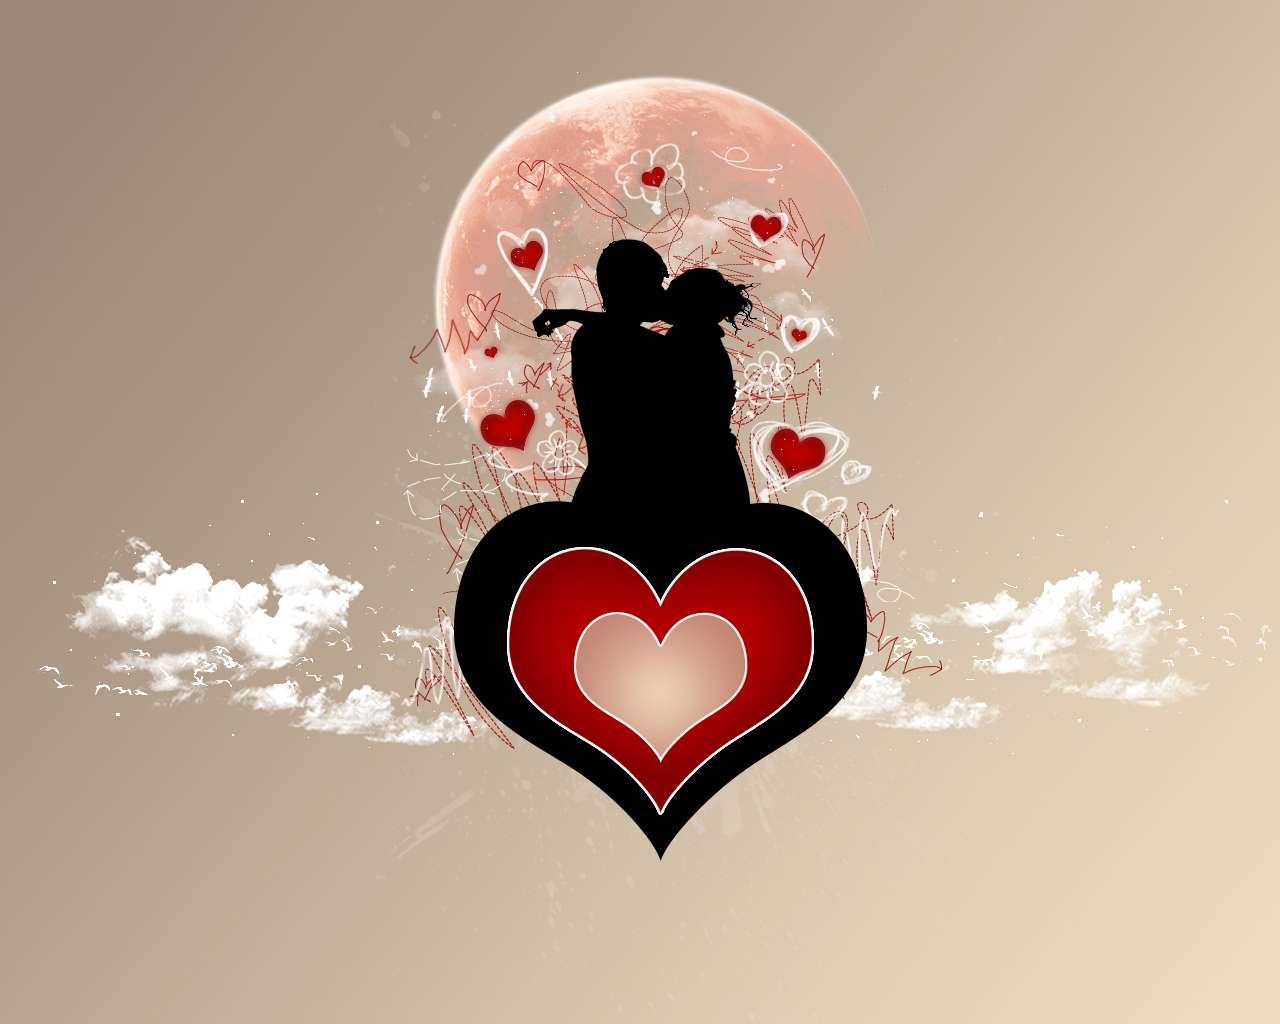 Imagenes Corazones, imagenes de amor, imágenes amistad